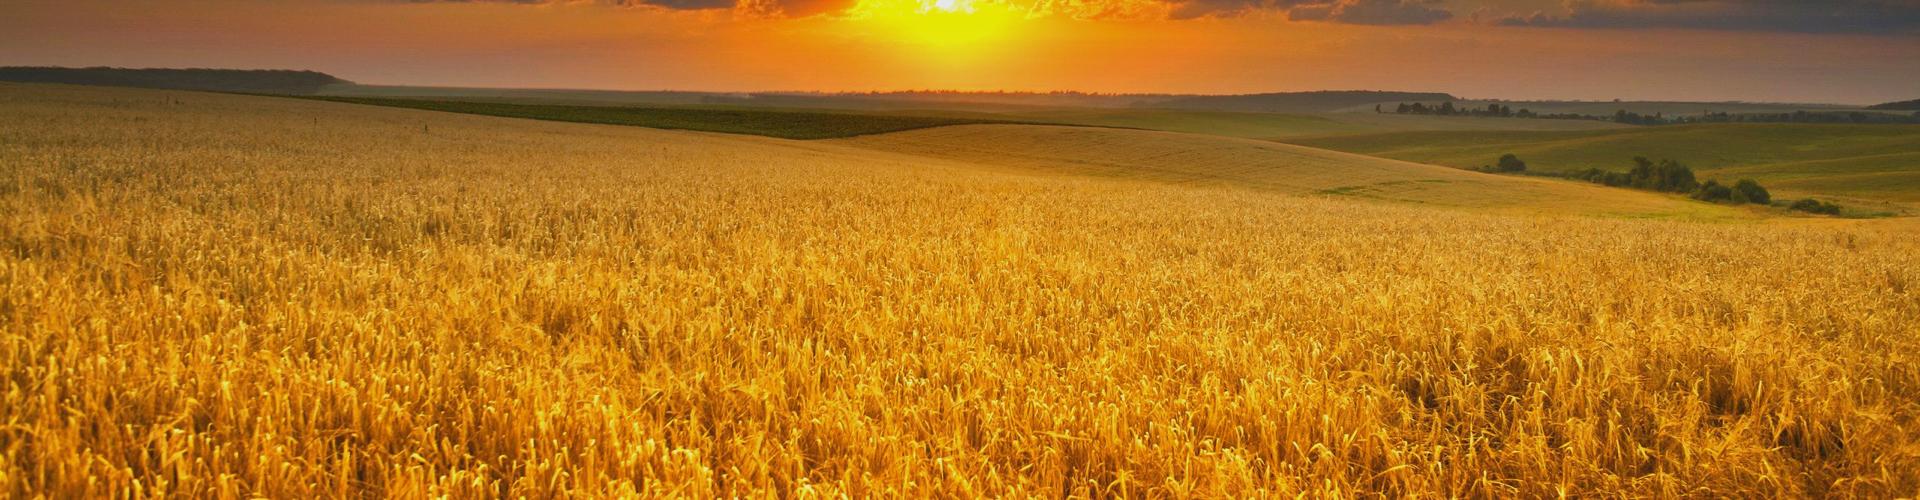 Helga Pleven Wheat